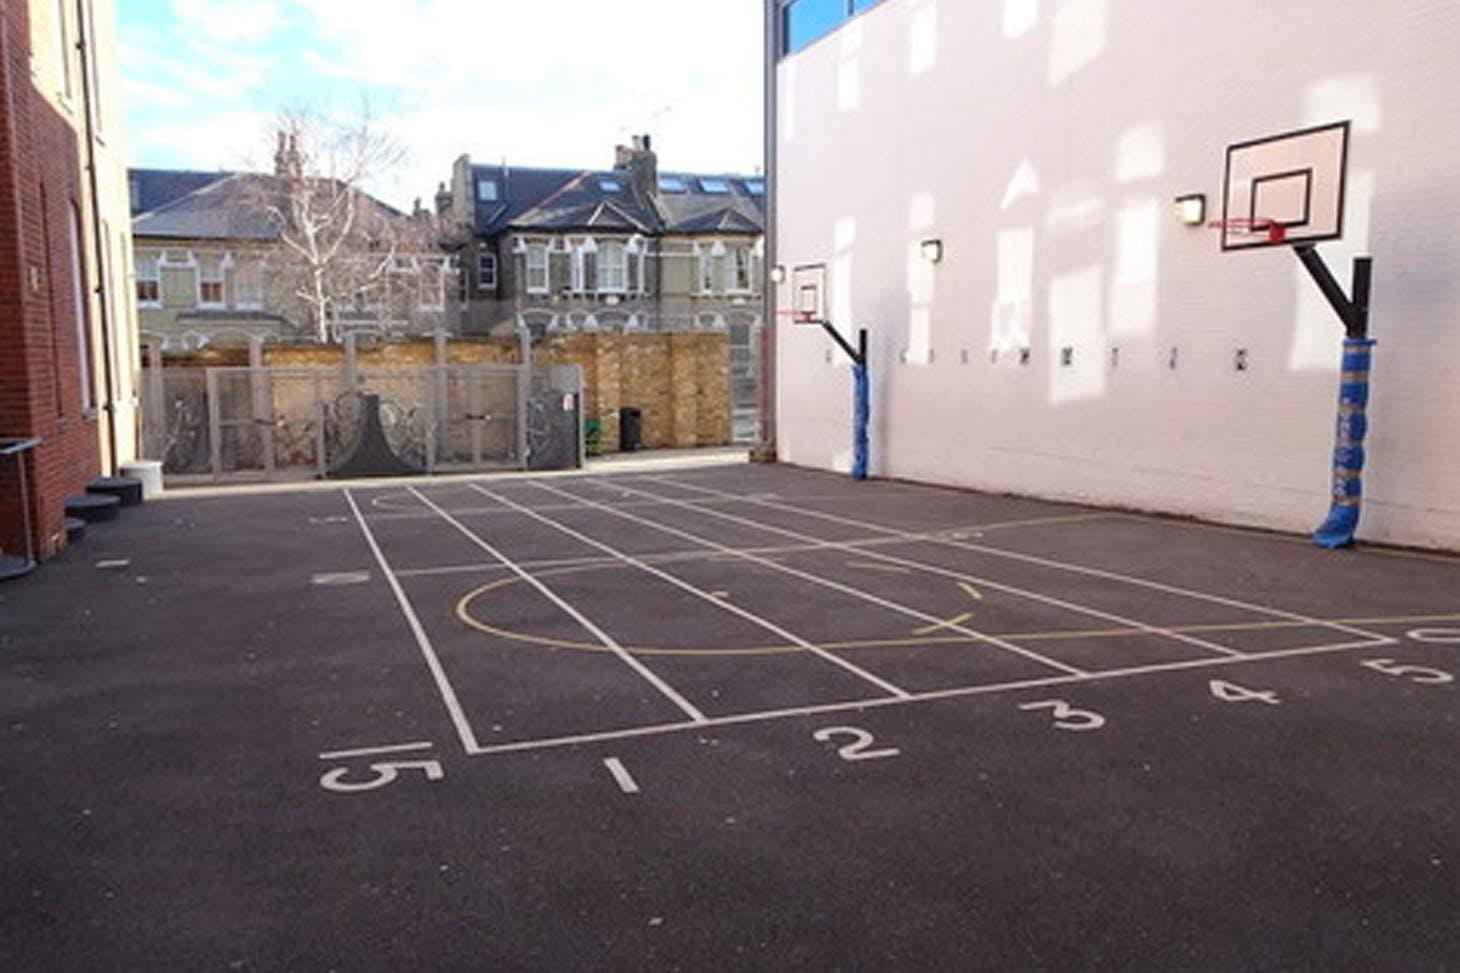 Ark Bolingbroke Academy Half court   Concrete basketball court